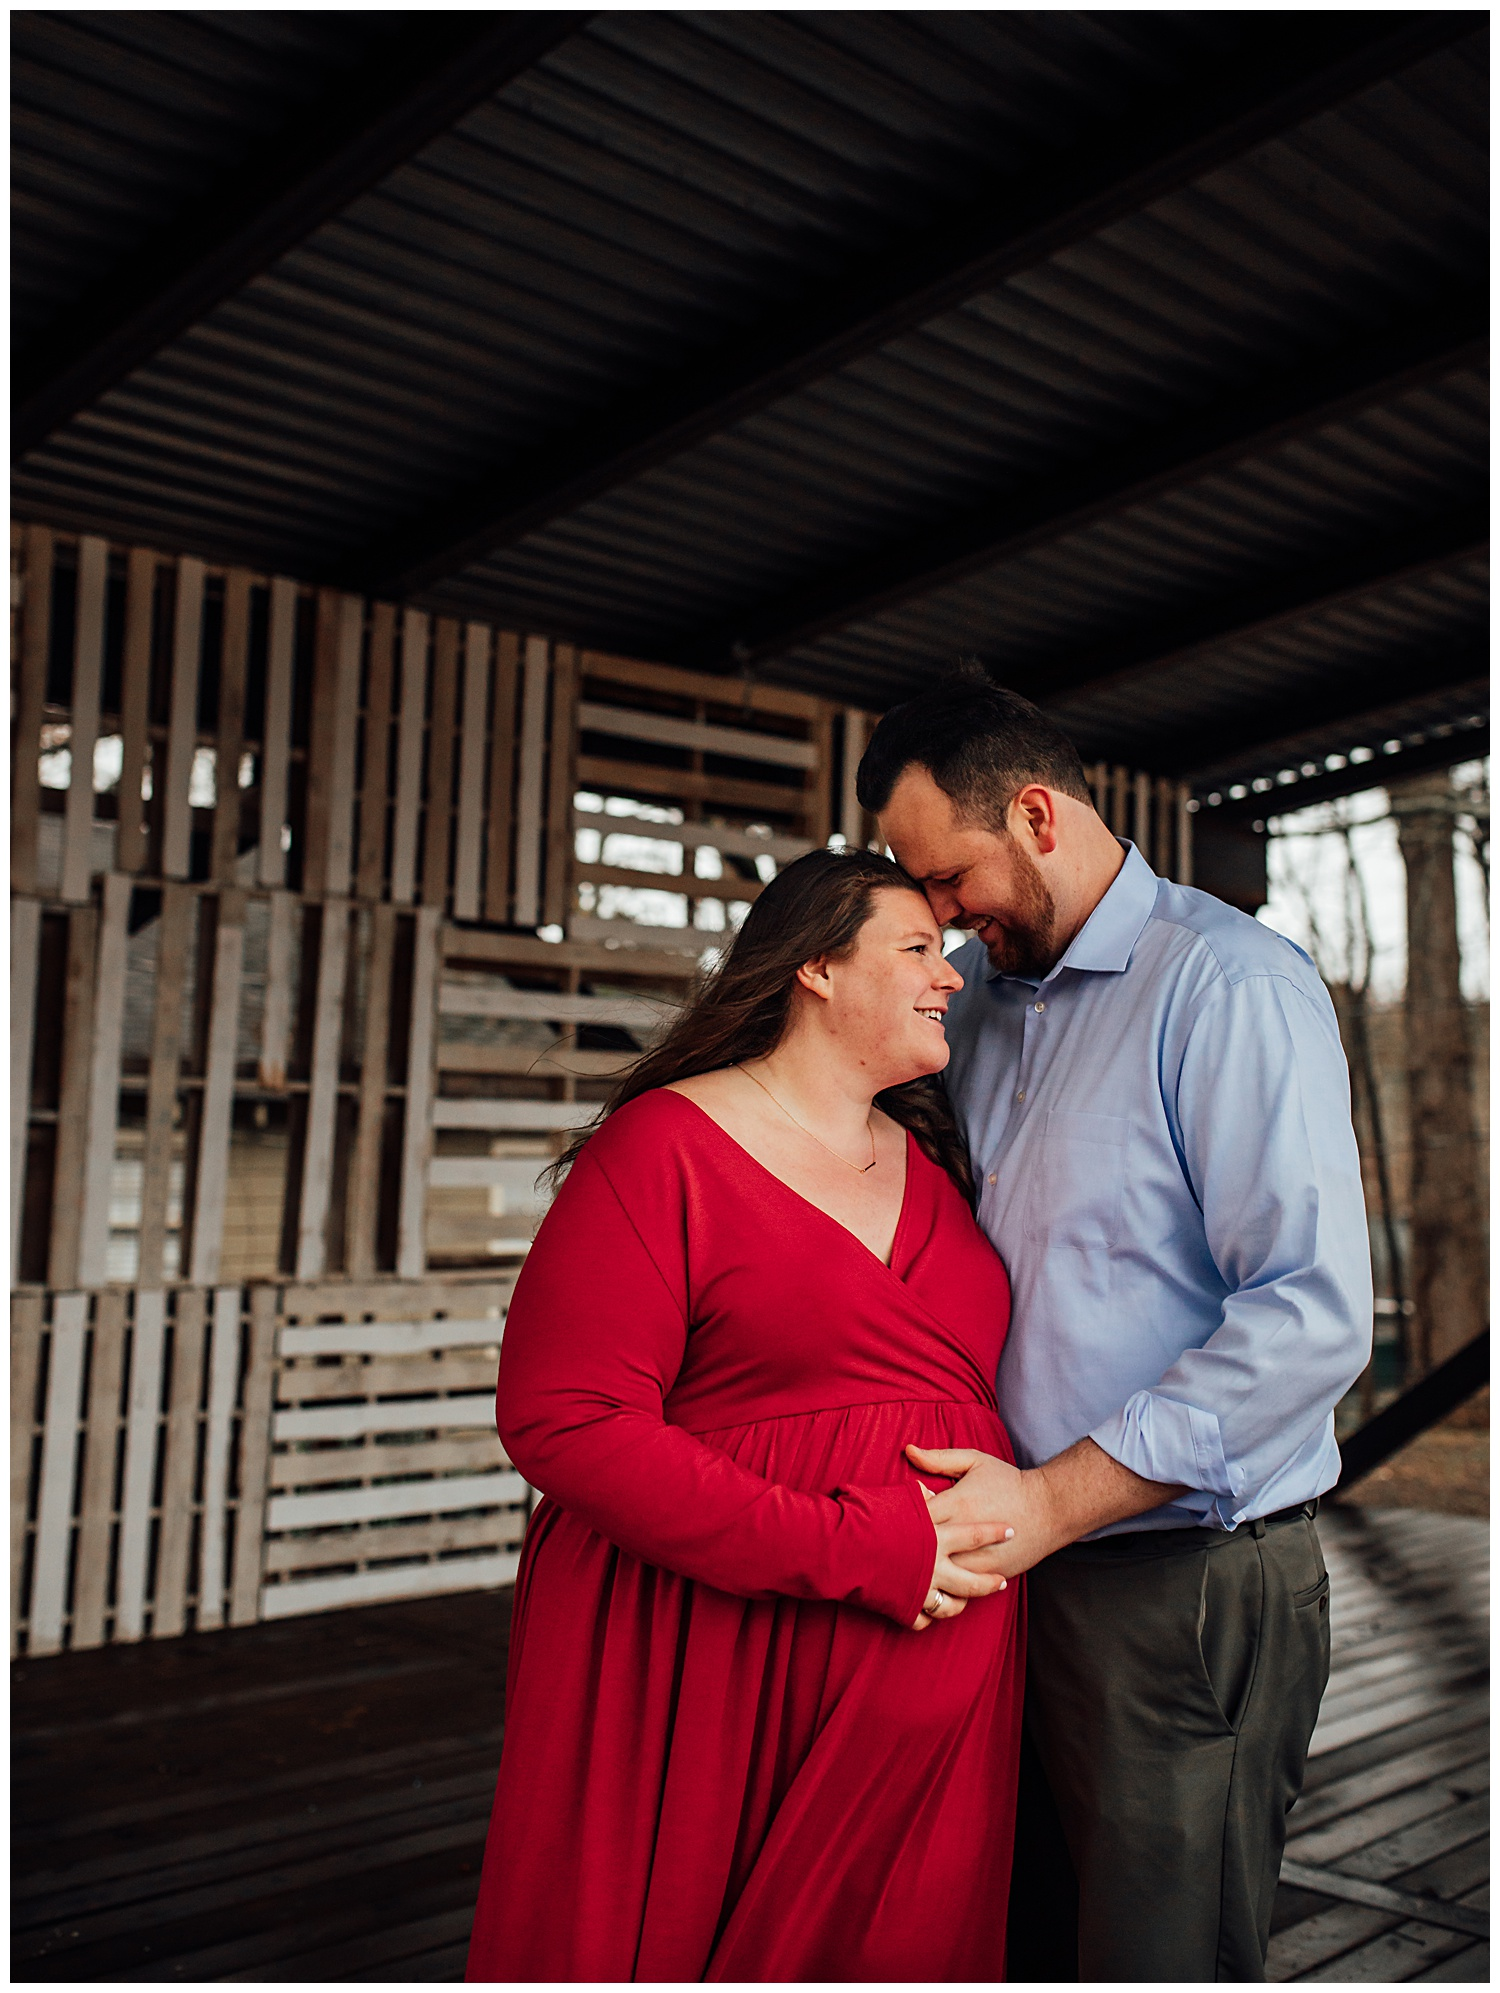 woodstock maternity photographer 01 (4).jpg